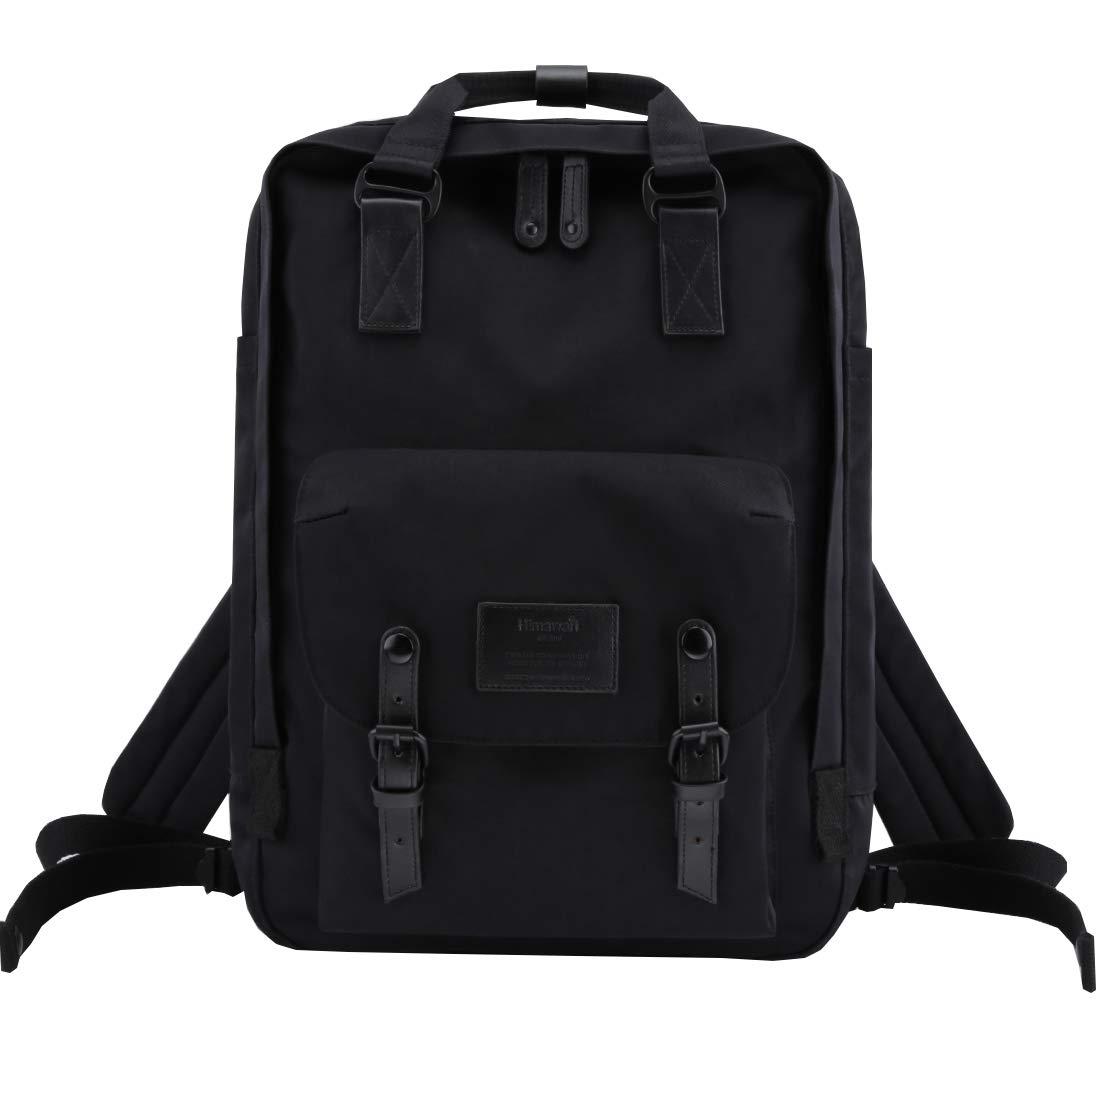 Himawari School Laptop Backpack for College Large